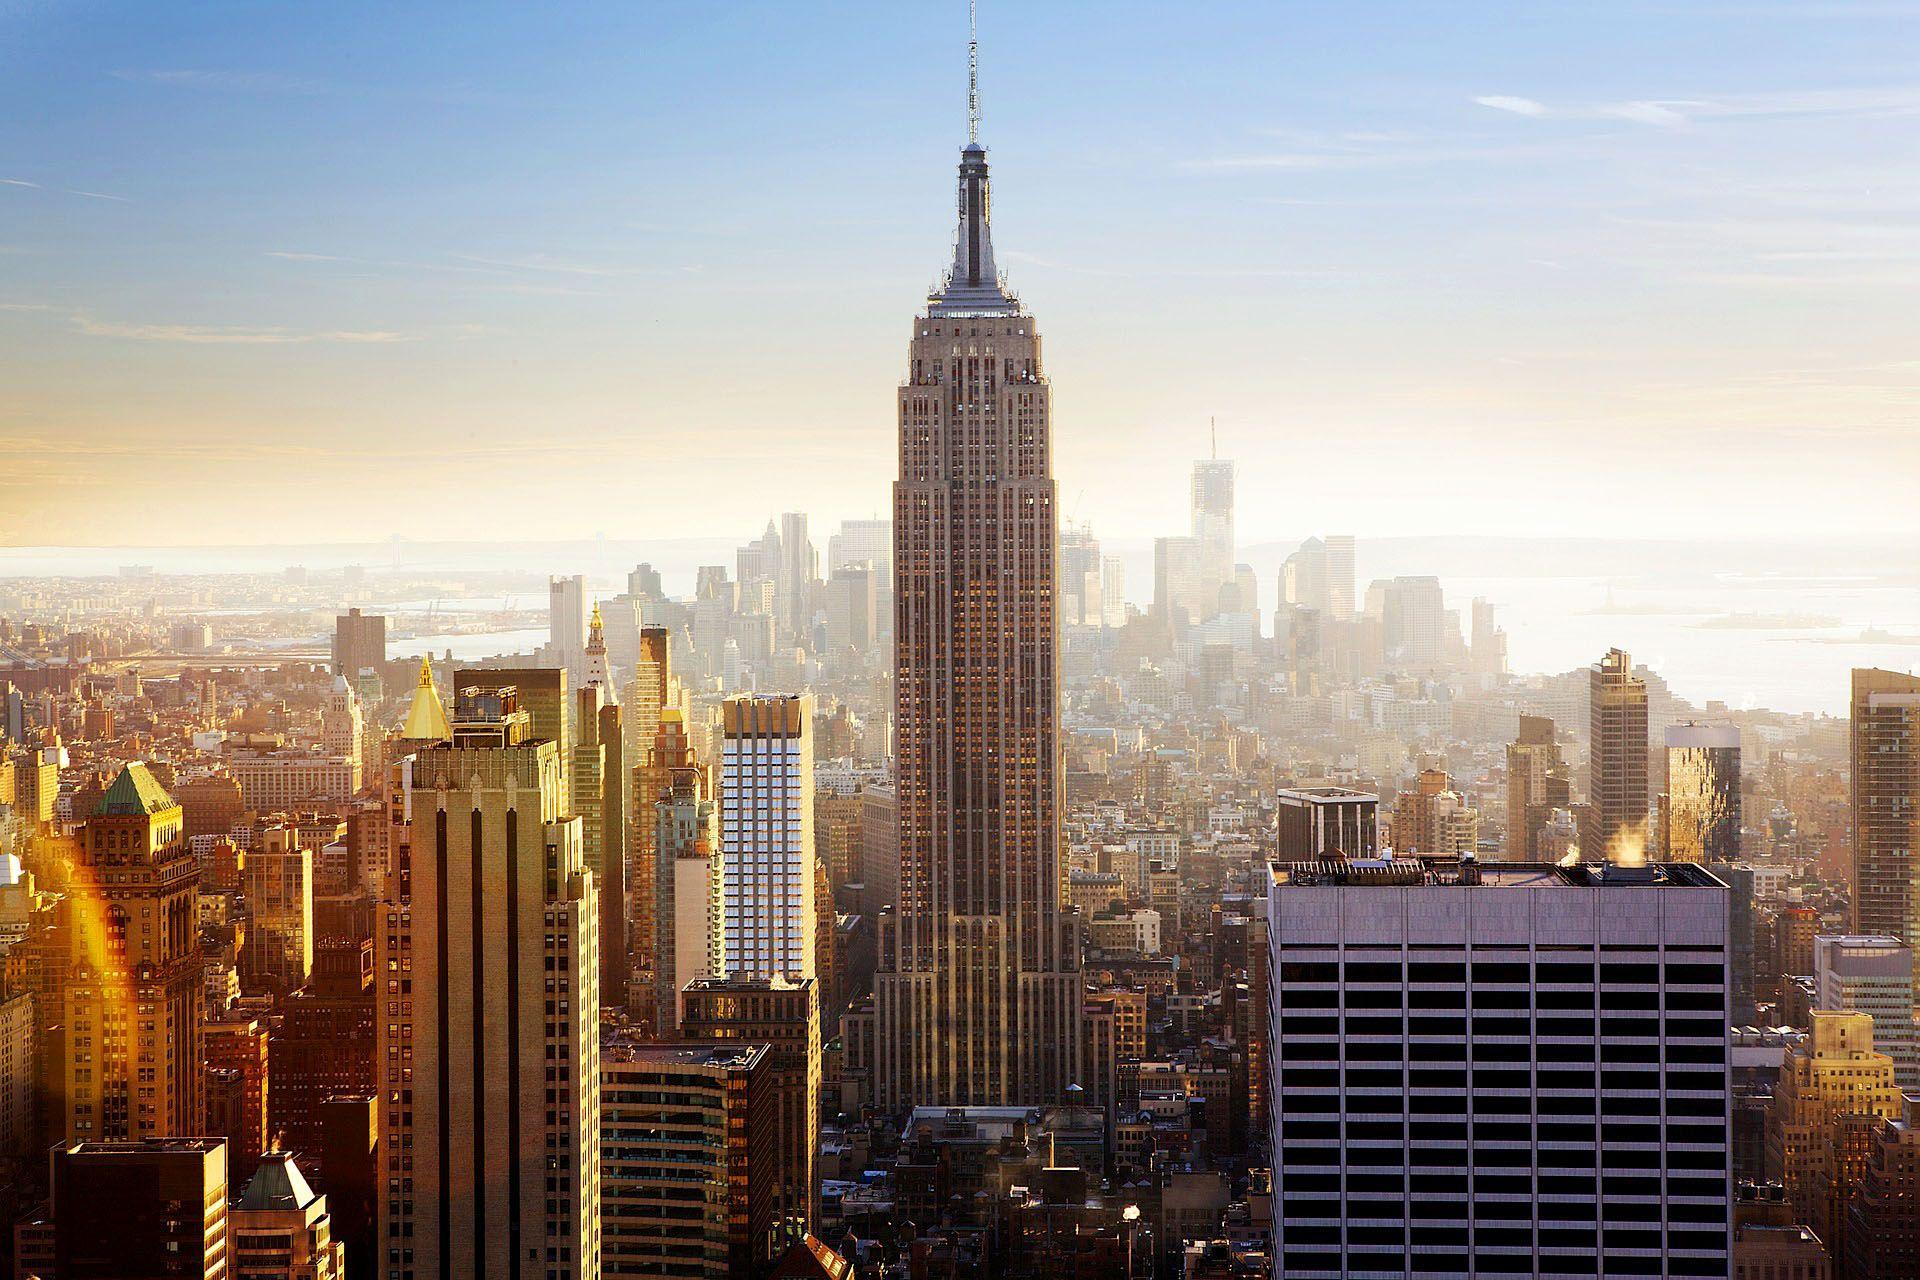 Empire State Building #USA #Travel #Resa #Resmål #New #York #NewYork #CIty #NYC #NewYorkCity #Empire #State #Building #EmpireStateBuilding